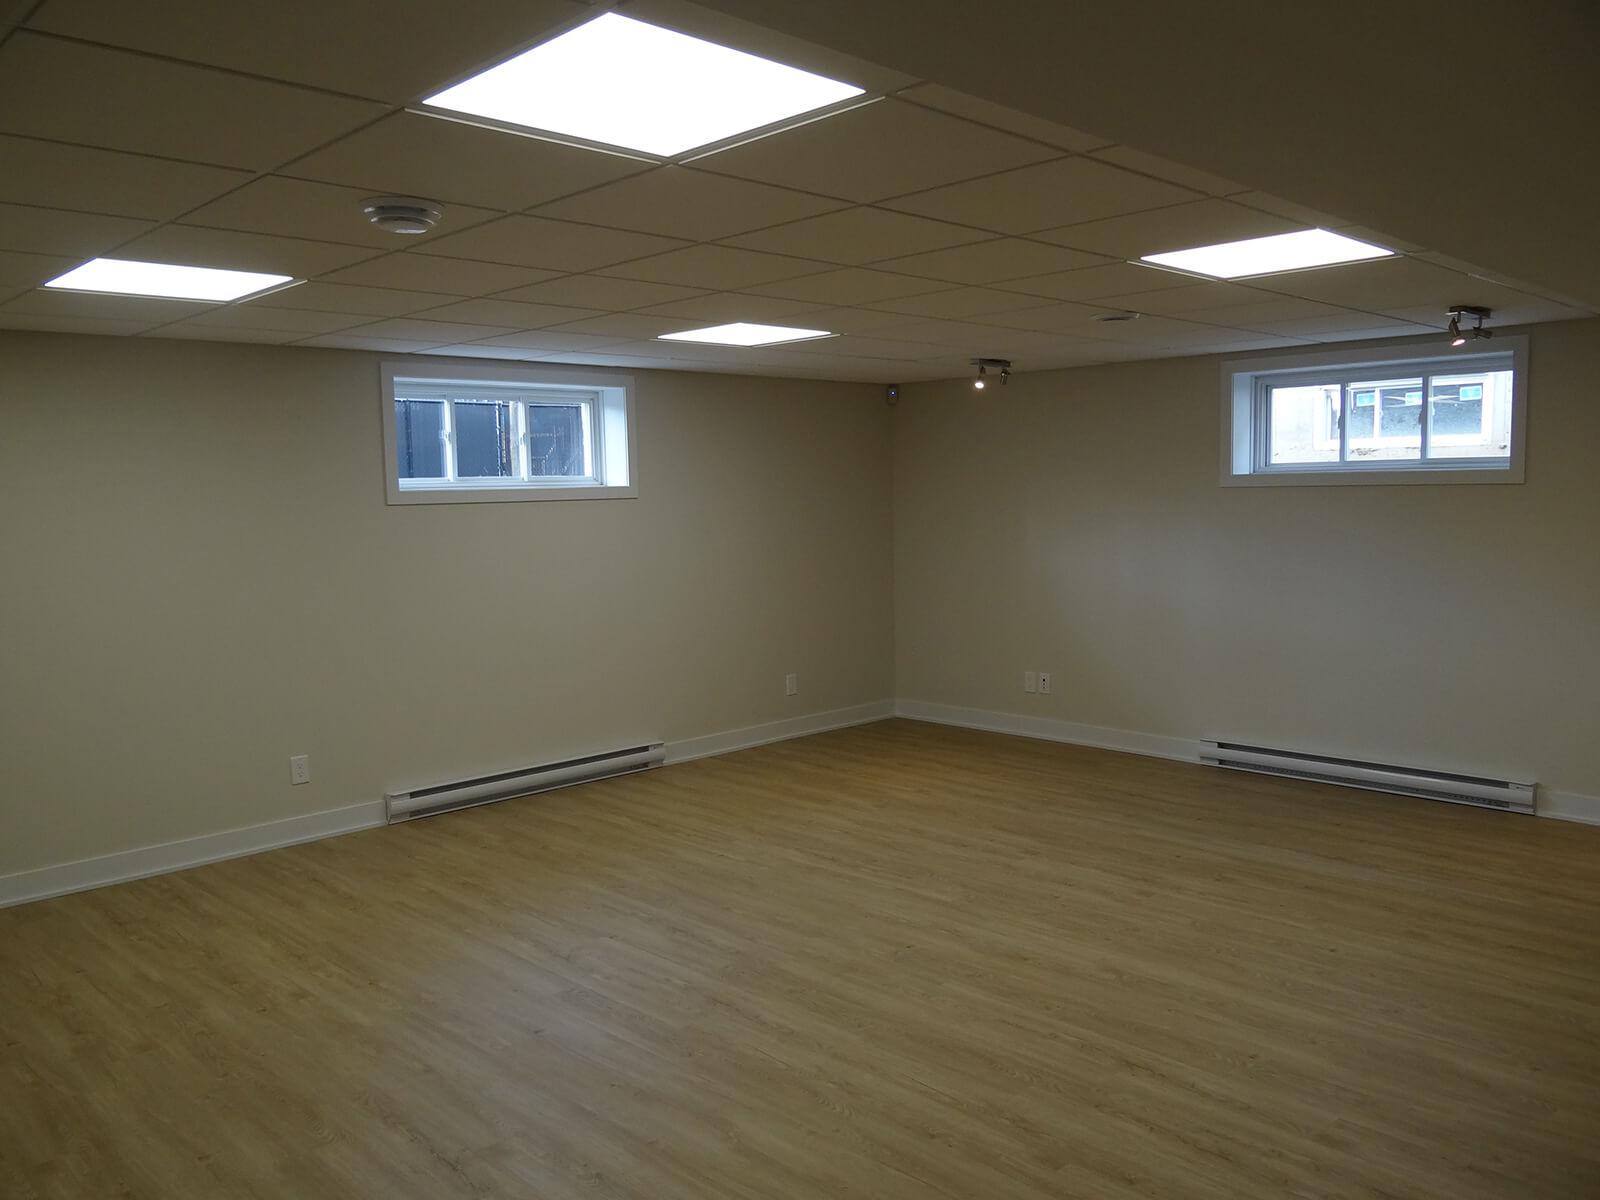 plafonds suspendus et luminaires